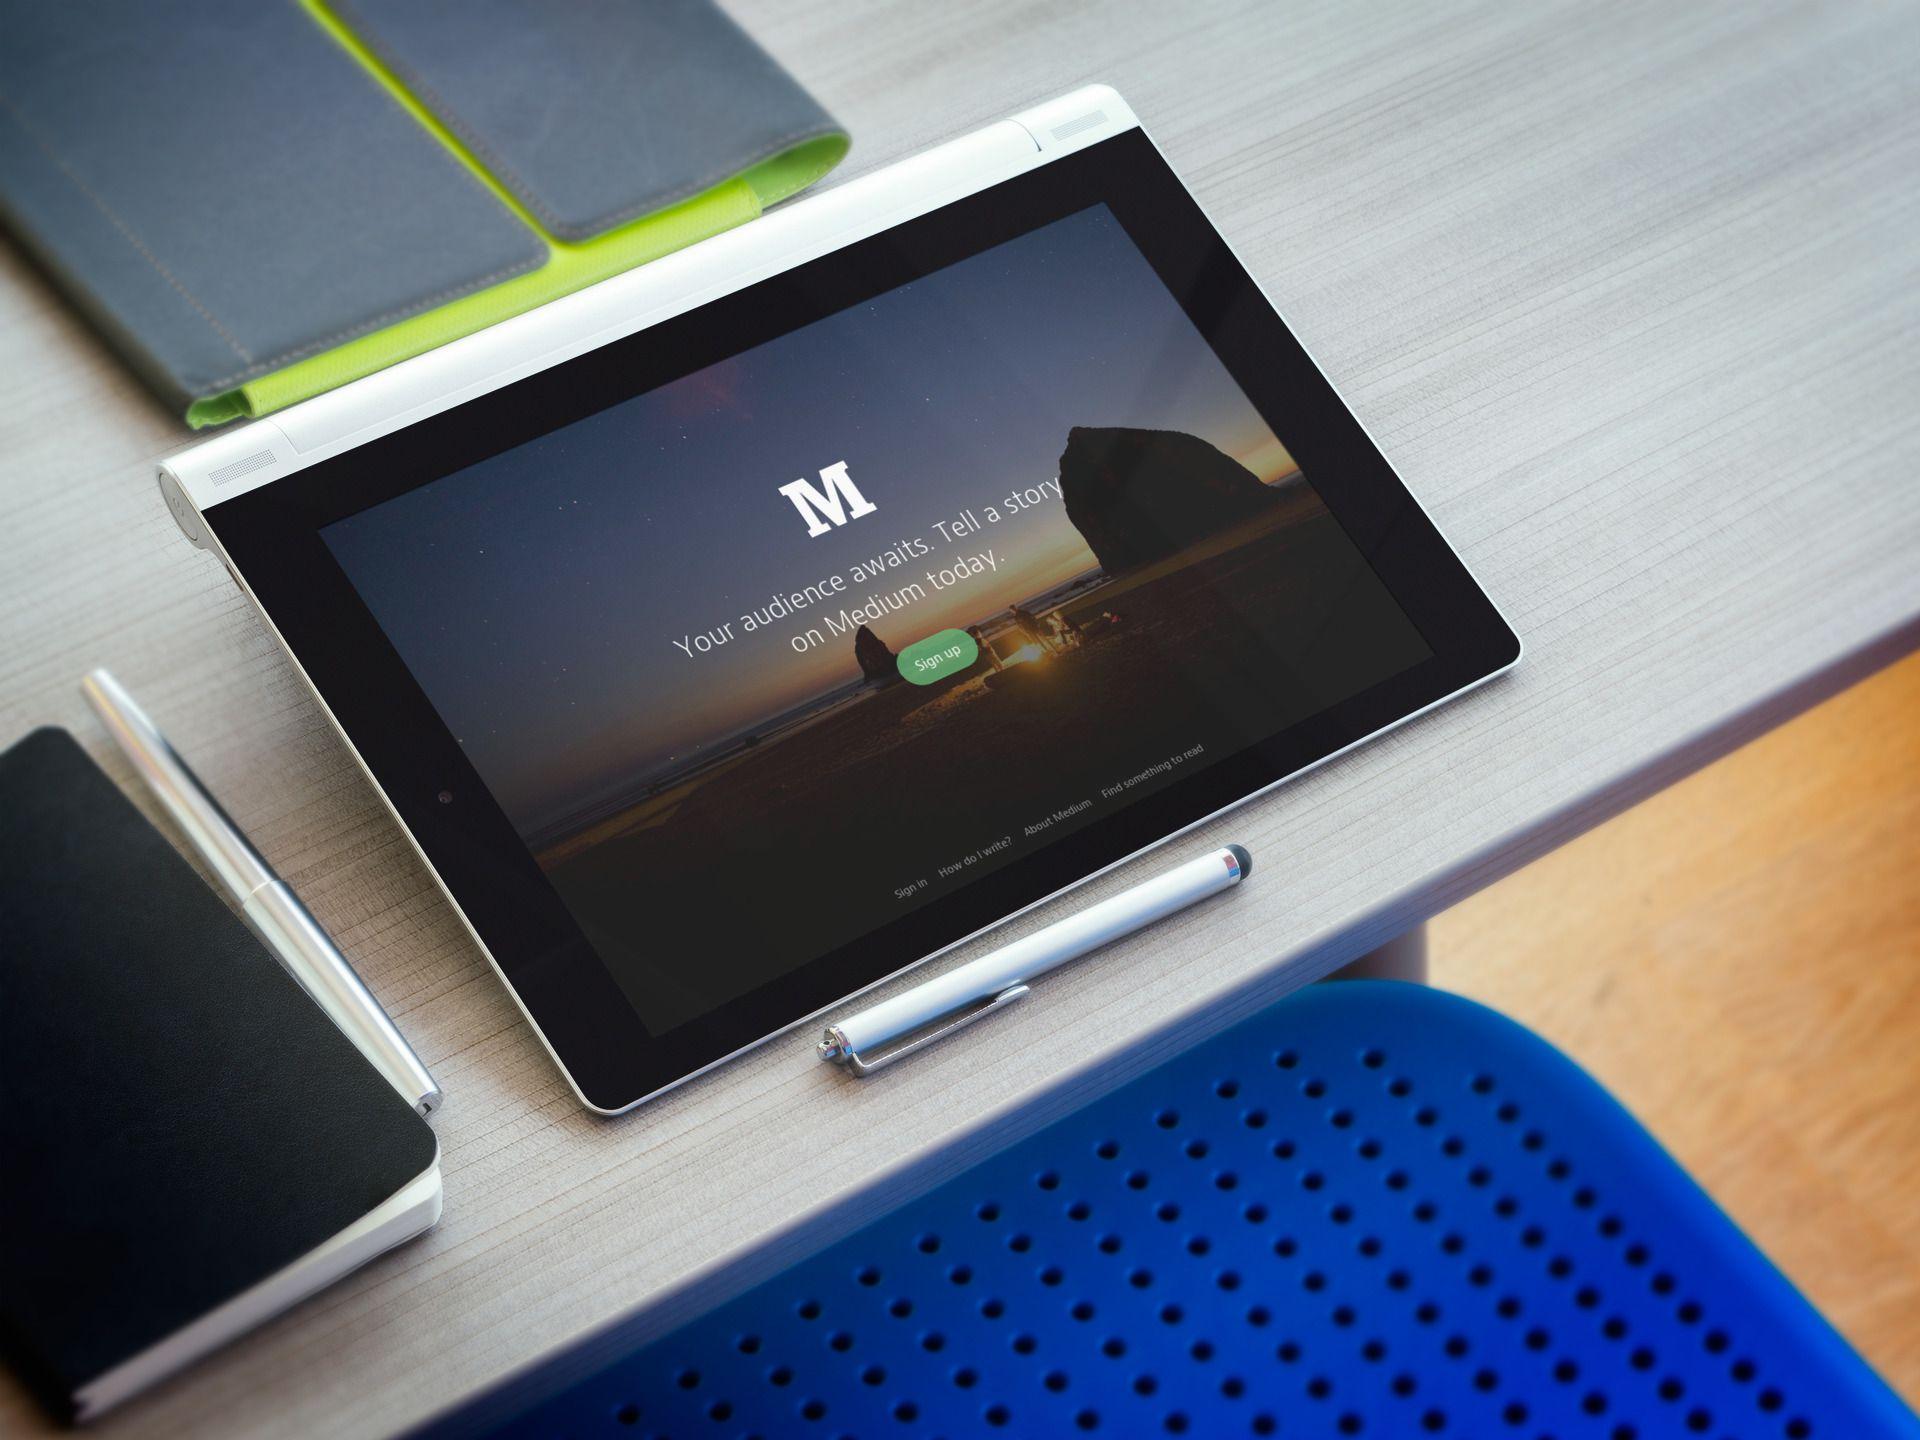 Mockup Tool Silver Lenovo Yoga at Workstation. New Android